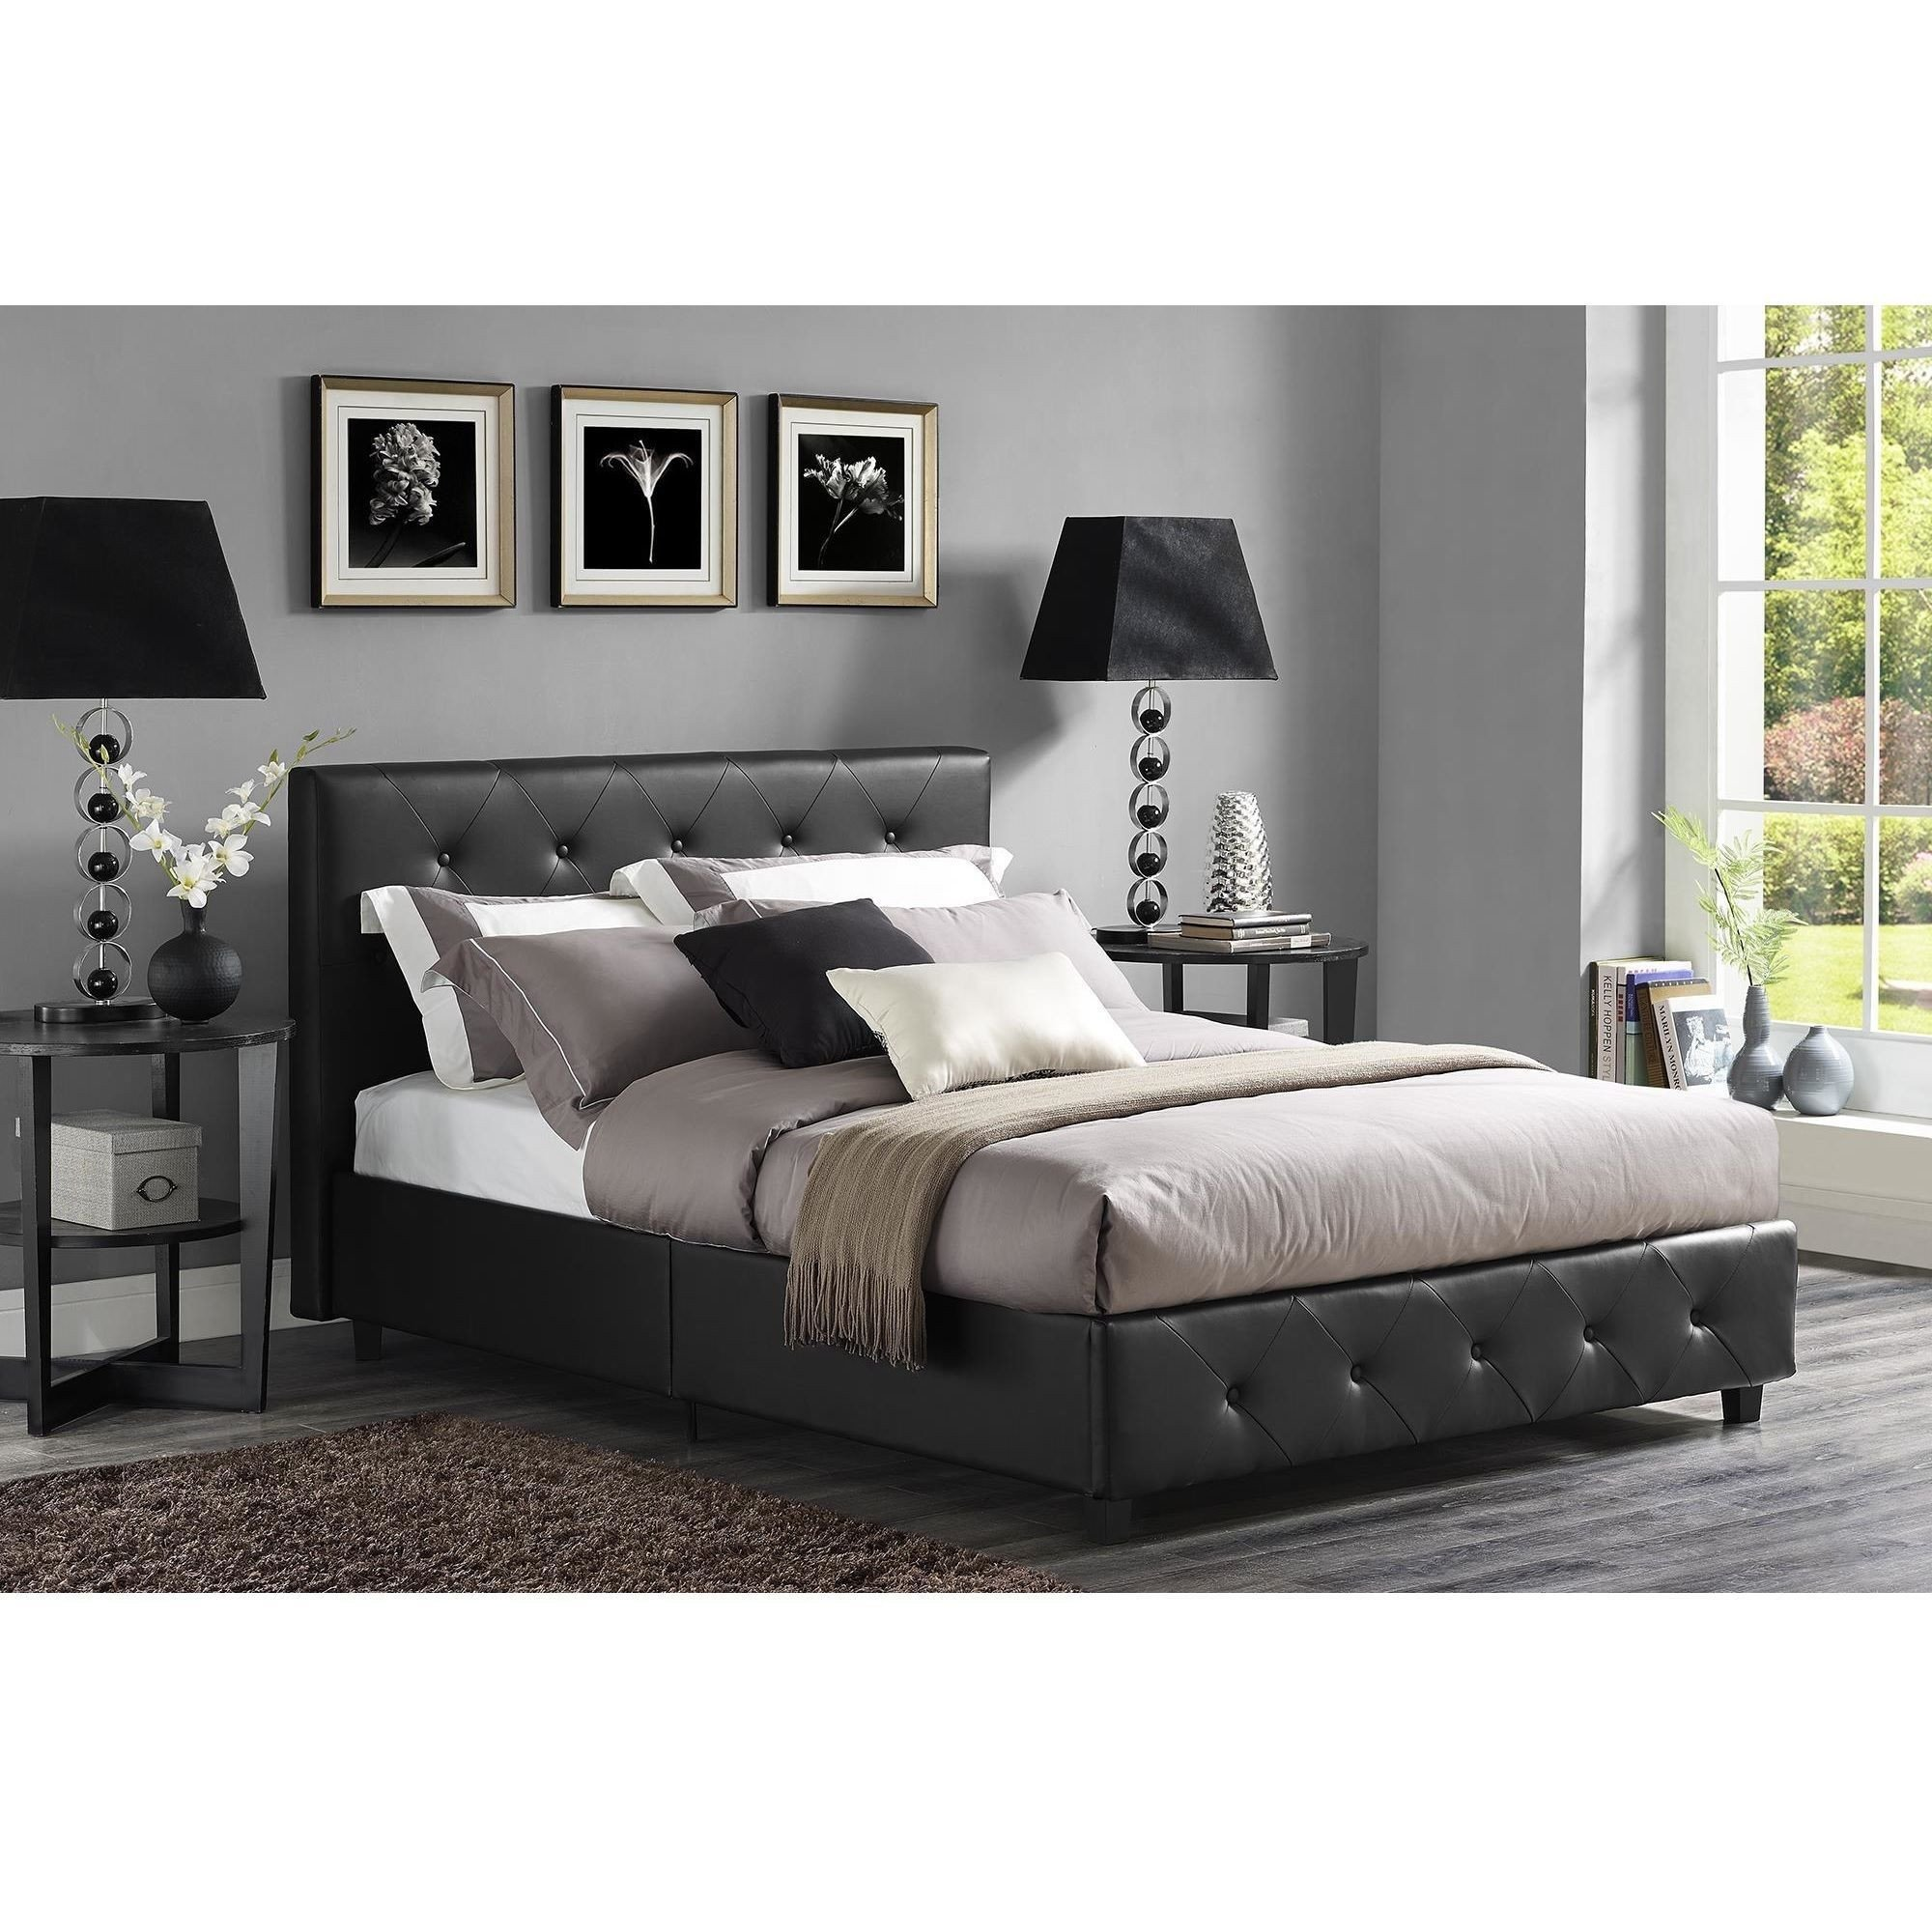 Tufted Headboard Bedroom Set Inspirational Wicker Park Claremont Black Faux Leather Upholstered Bed